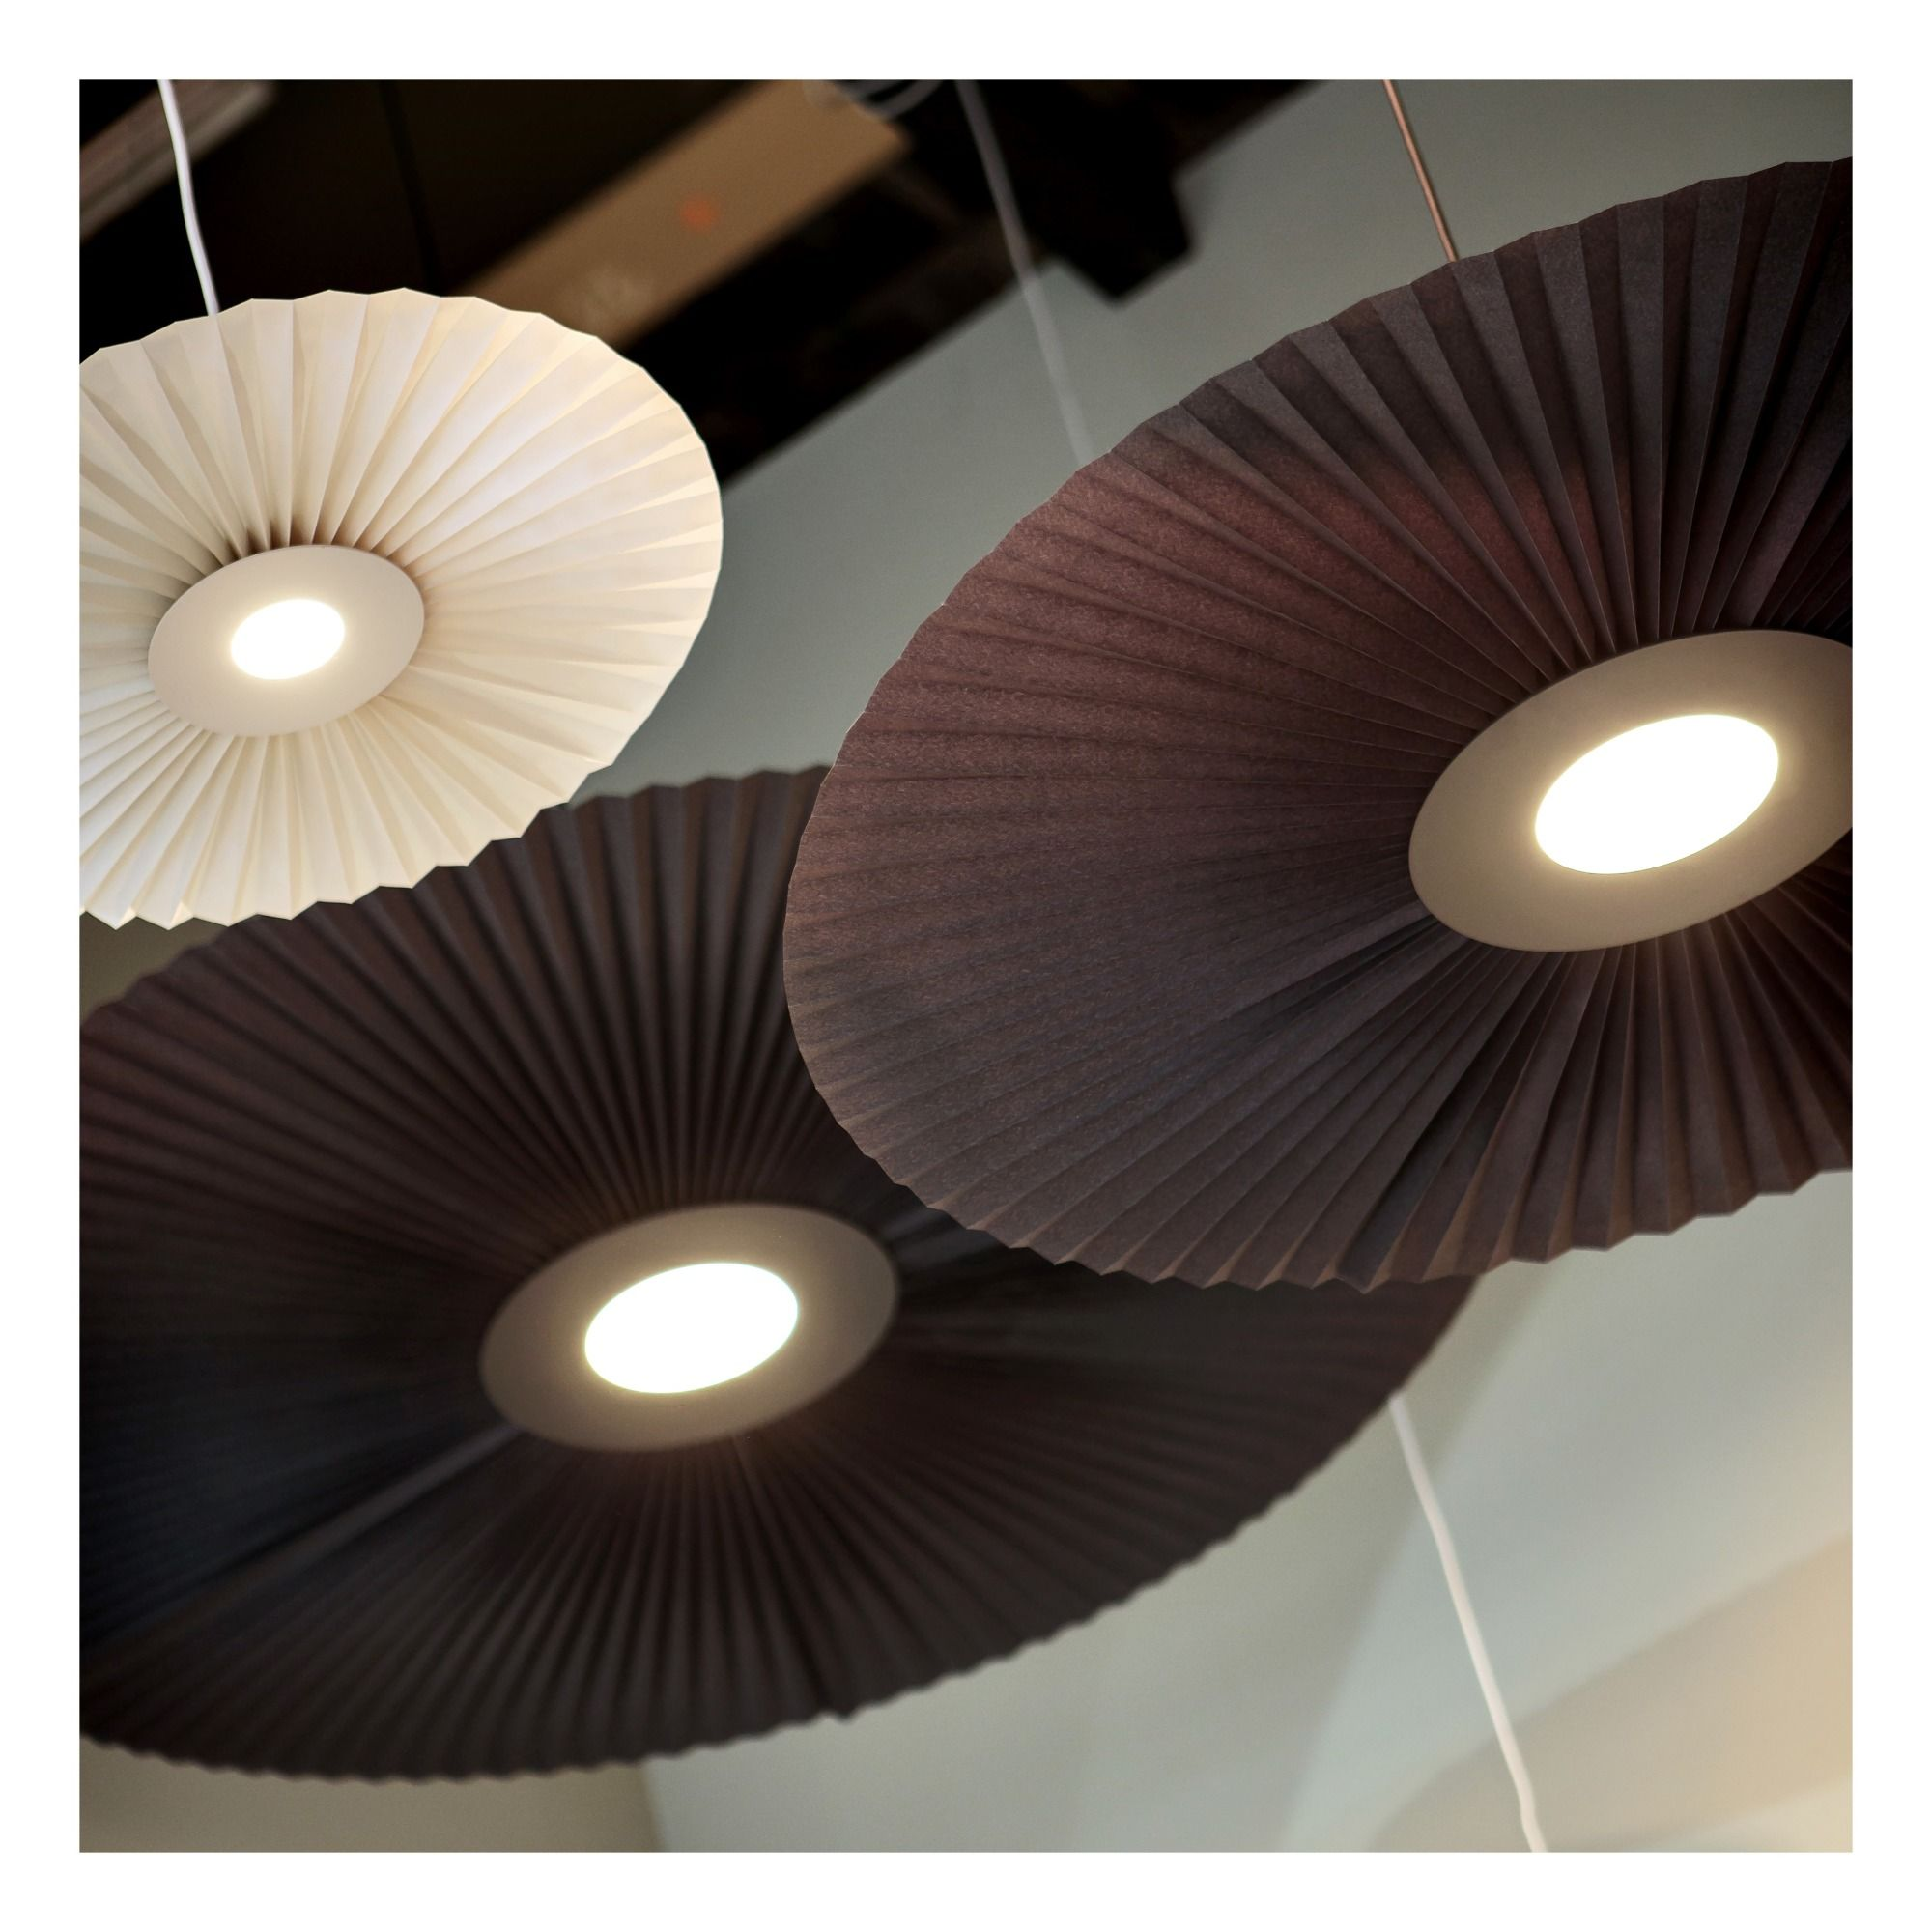 Hangelampe Carmen Product Hange Lampe Lampe Pendelleuchte